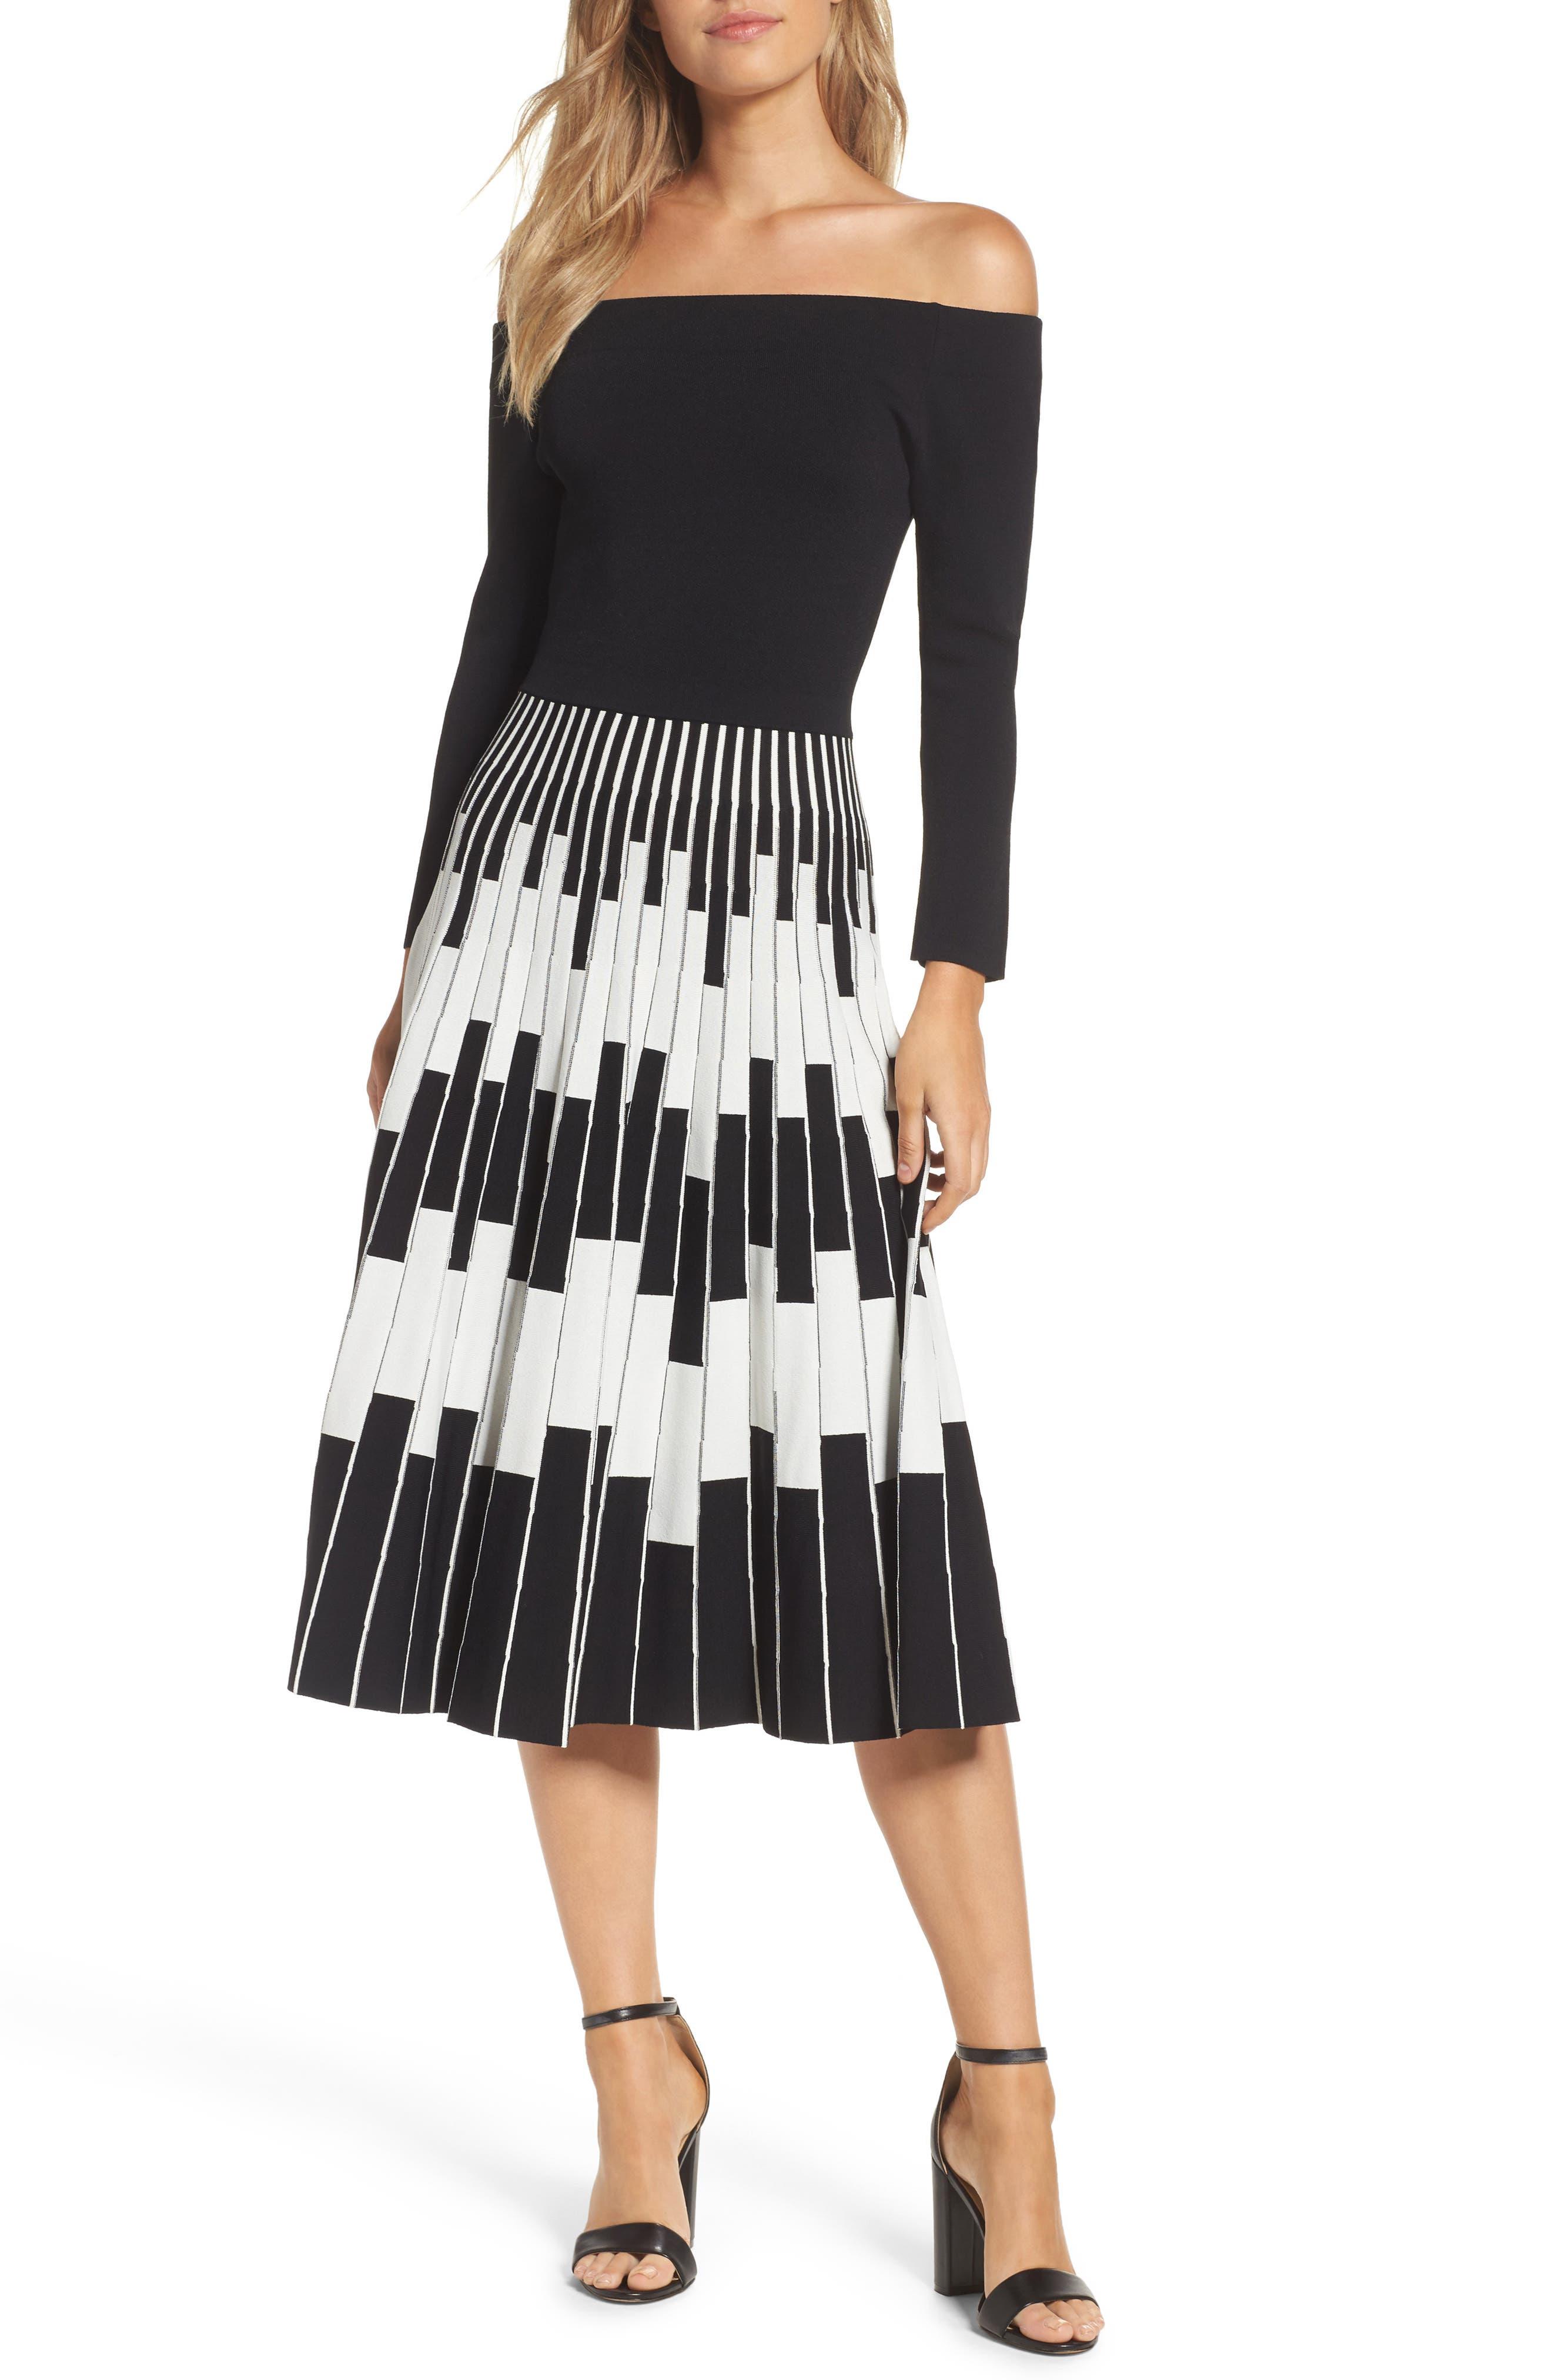 Off the Shoulder Midi Dress,                             Main thumbnail 1, color,                             Black/ Ivory